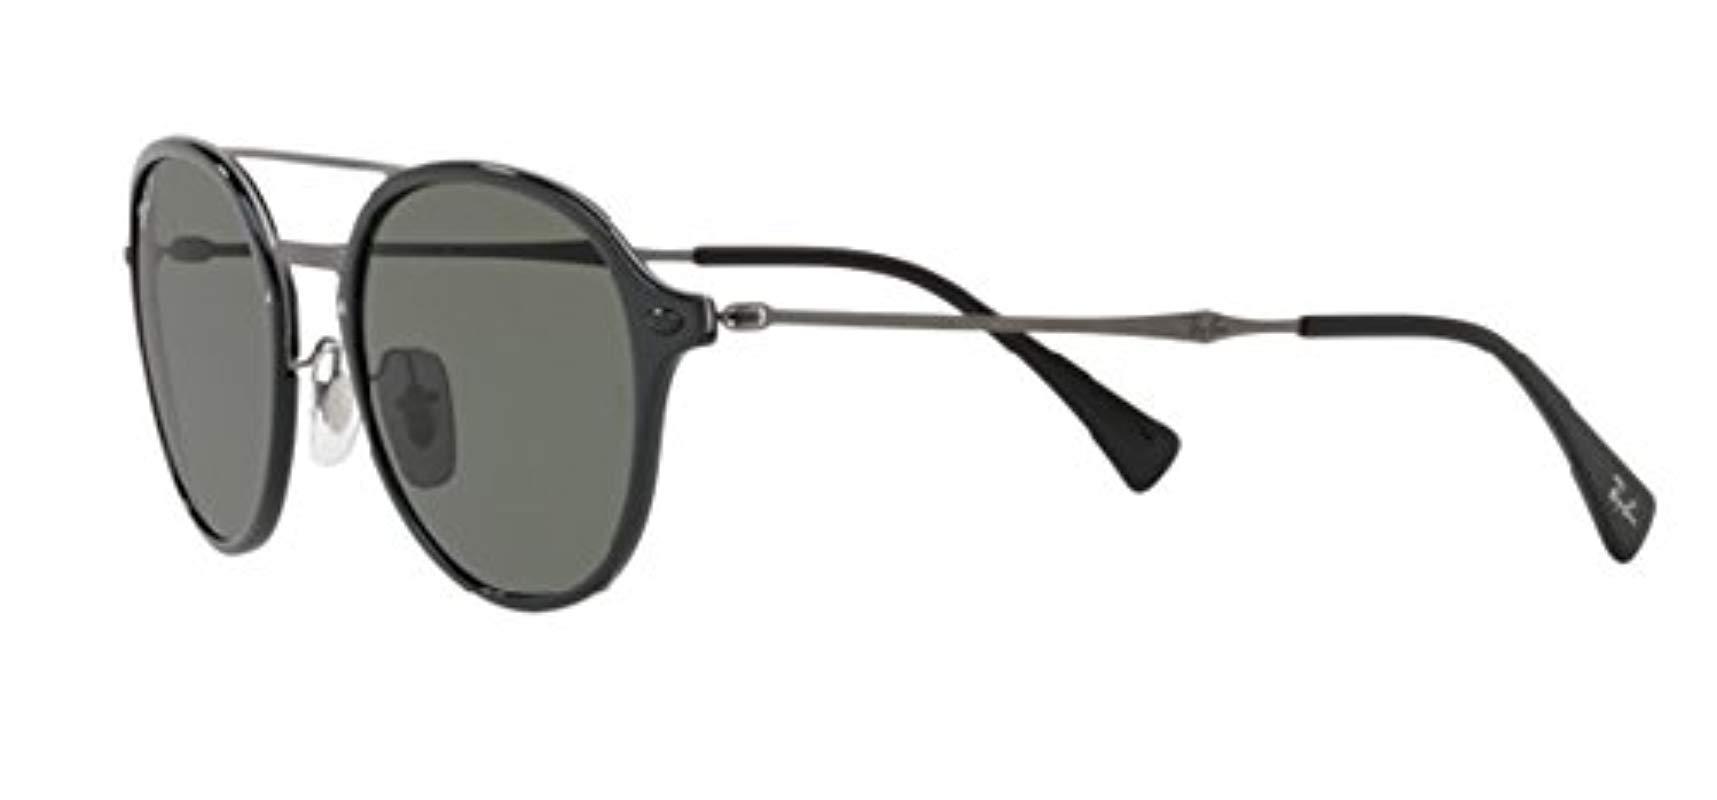 a79e4f9e3f Ray-Ban - Black Rb4287 Sunglasses for Men - Lyst. View fullscreen